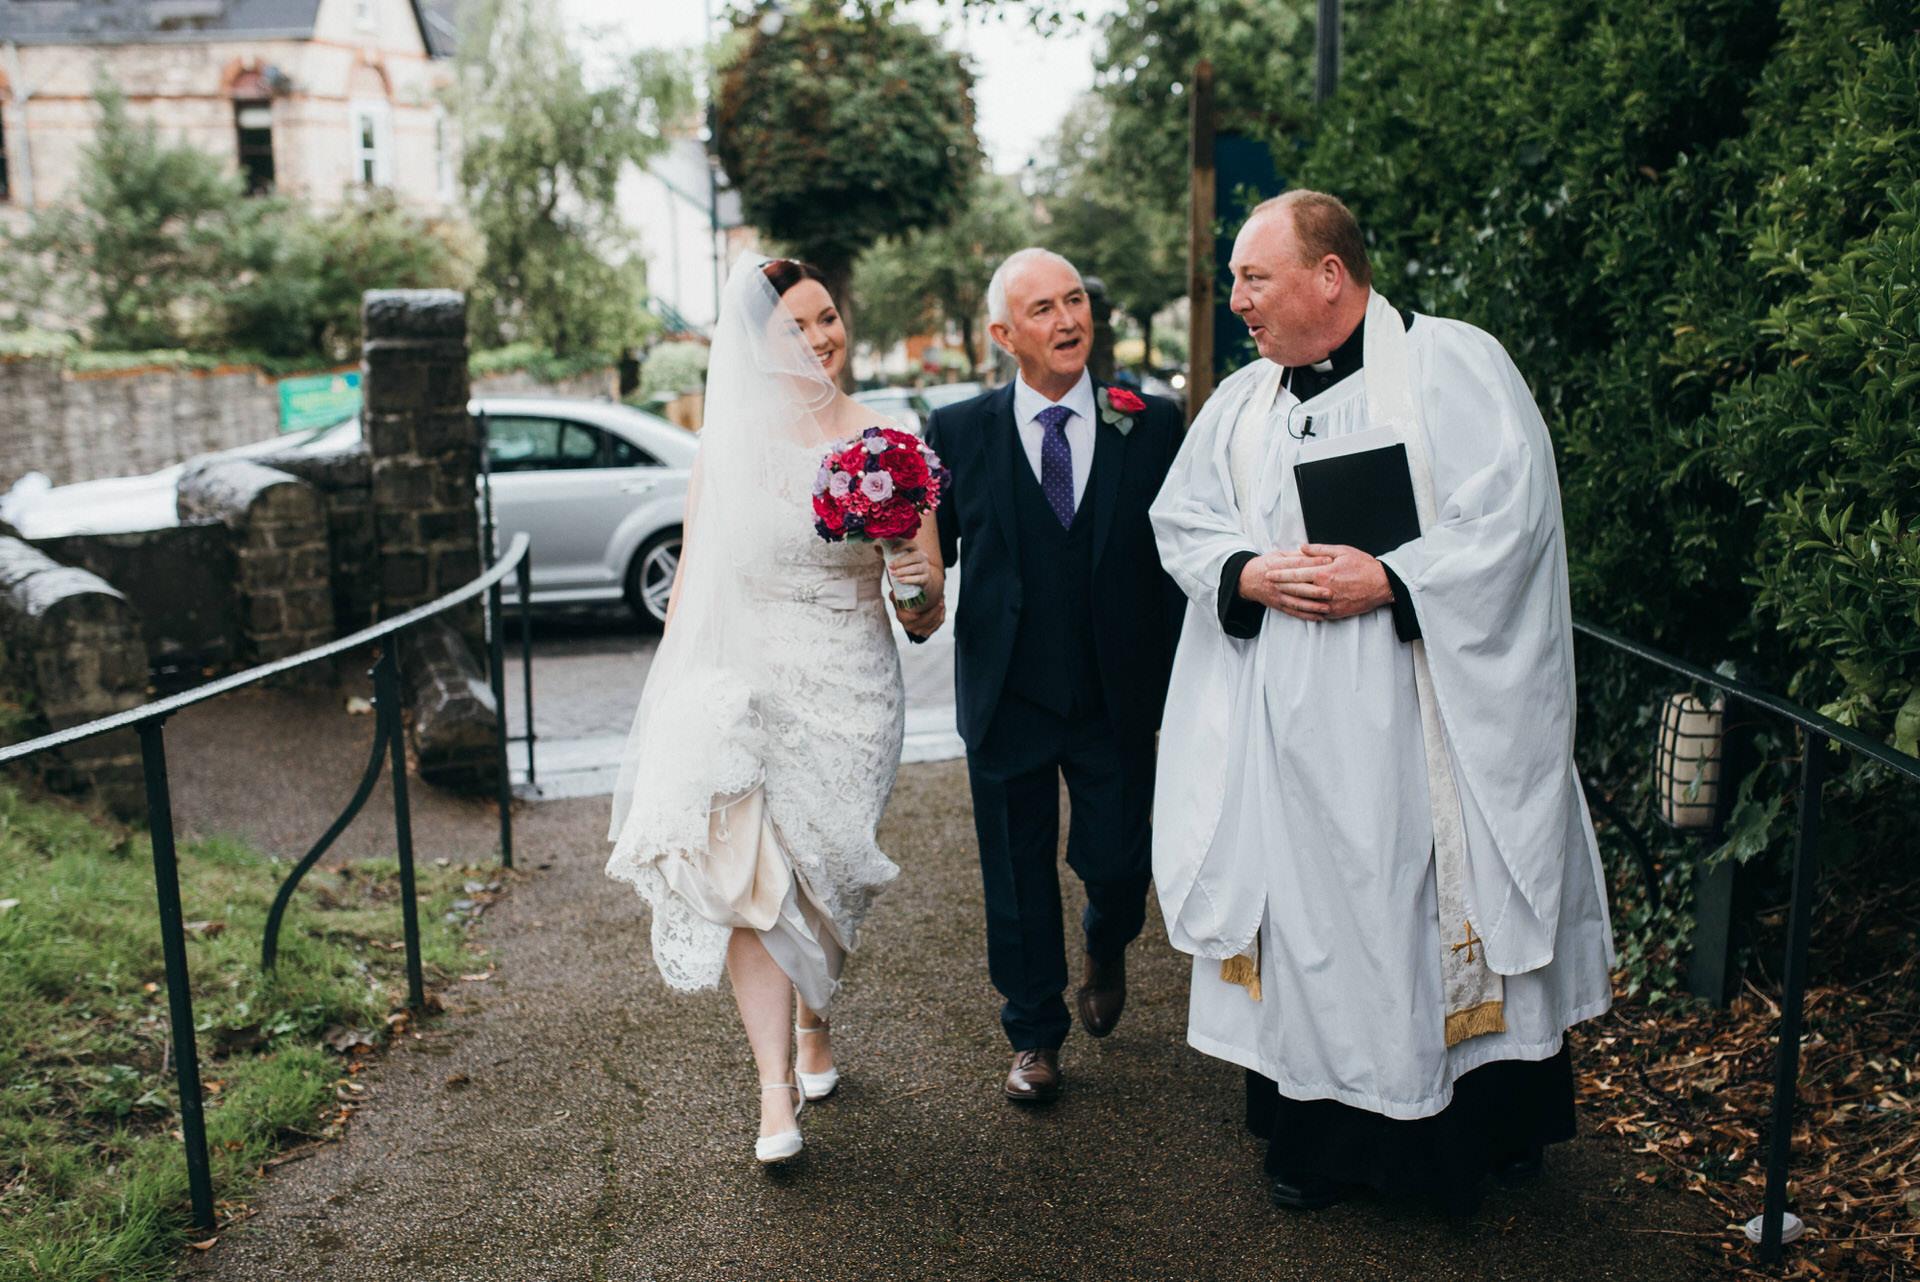 Penarth wedding photography siandan 019